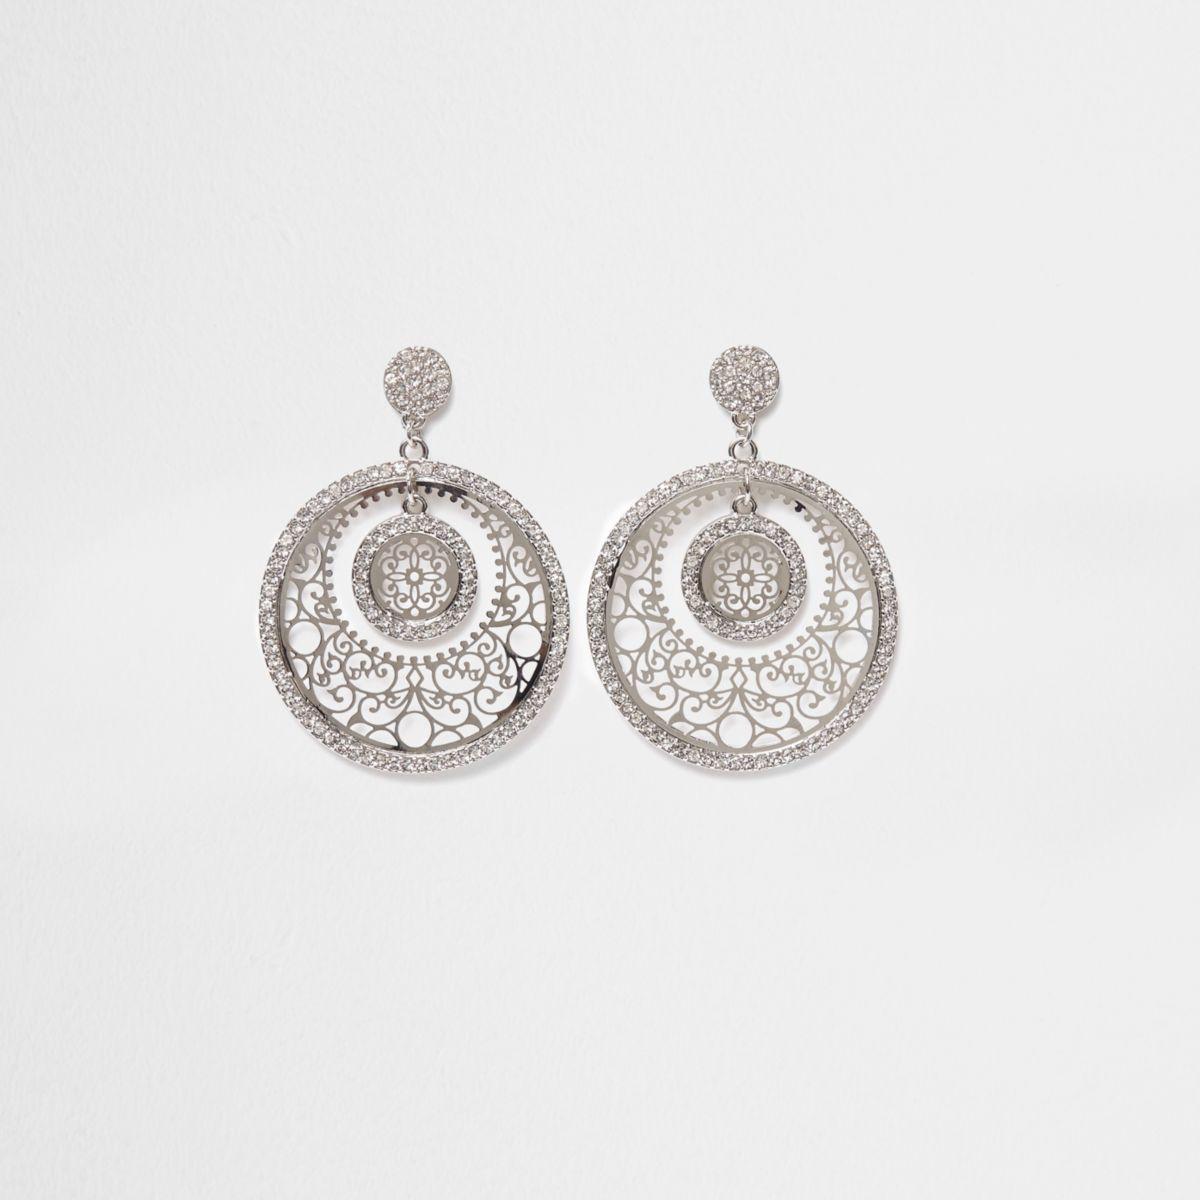 Silver tone filigree disc drop earrings